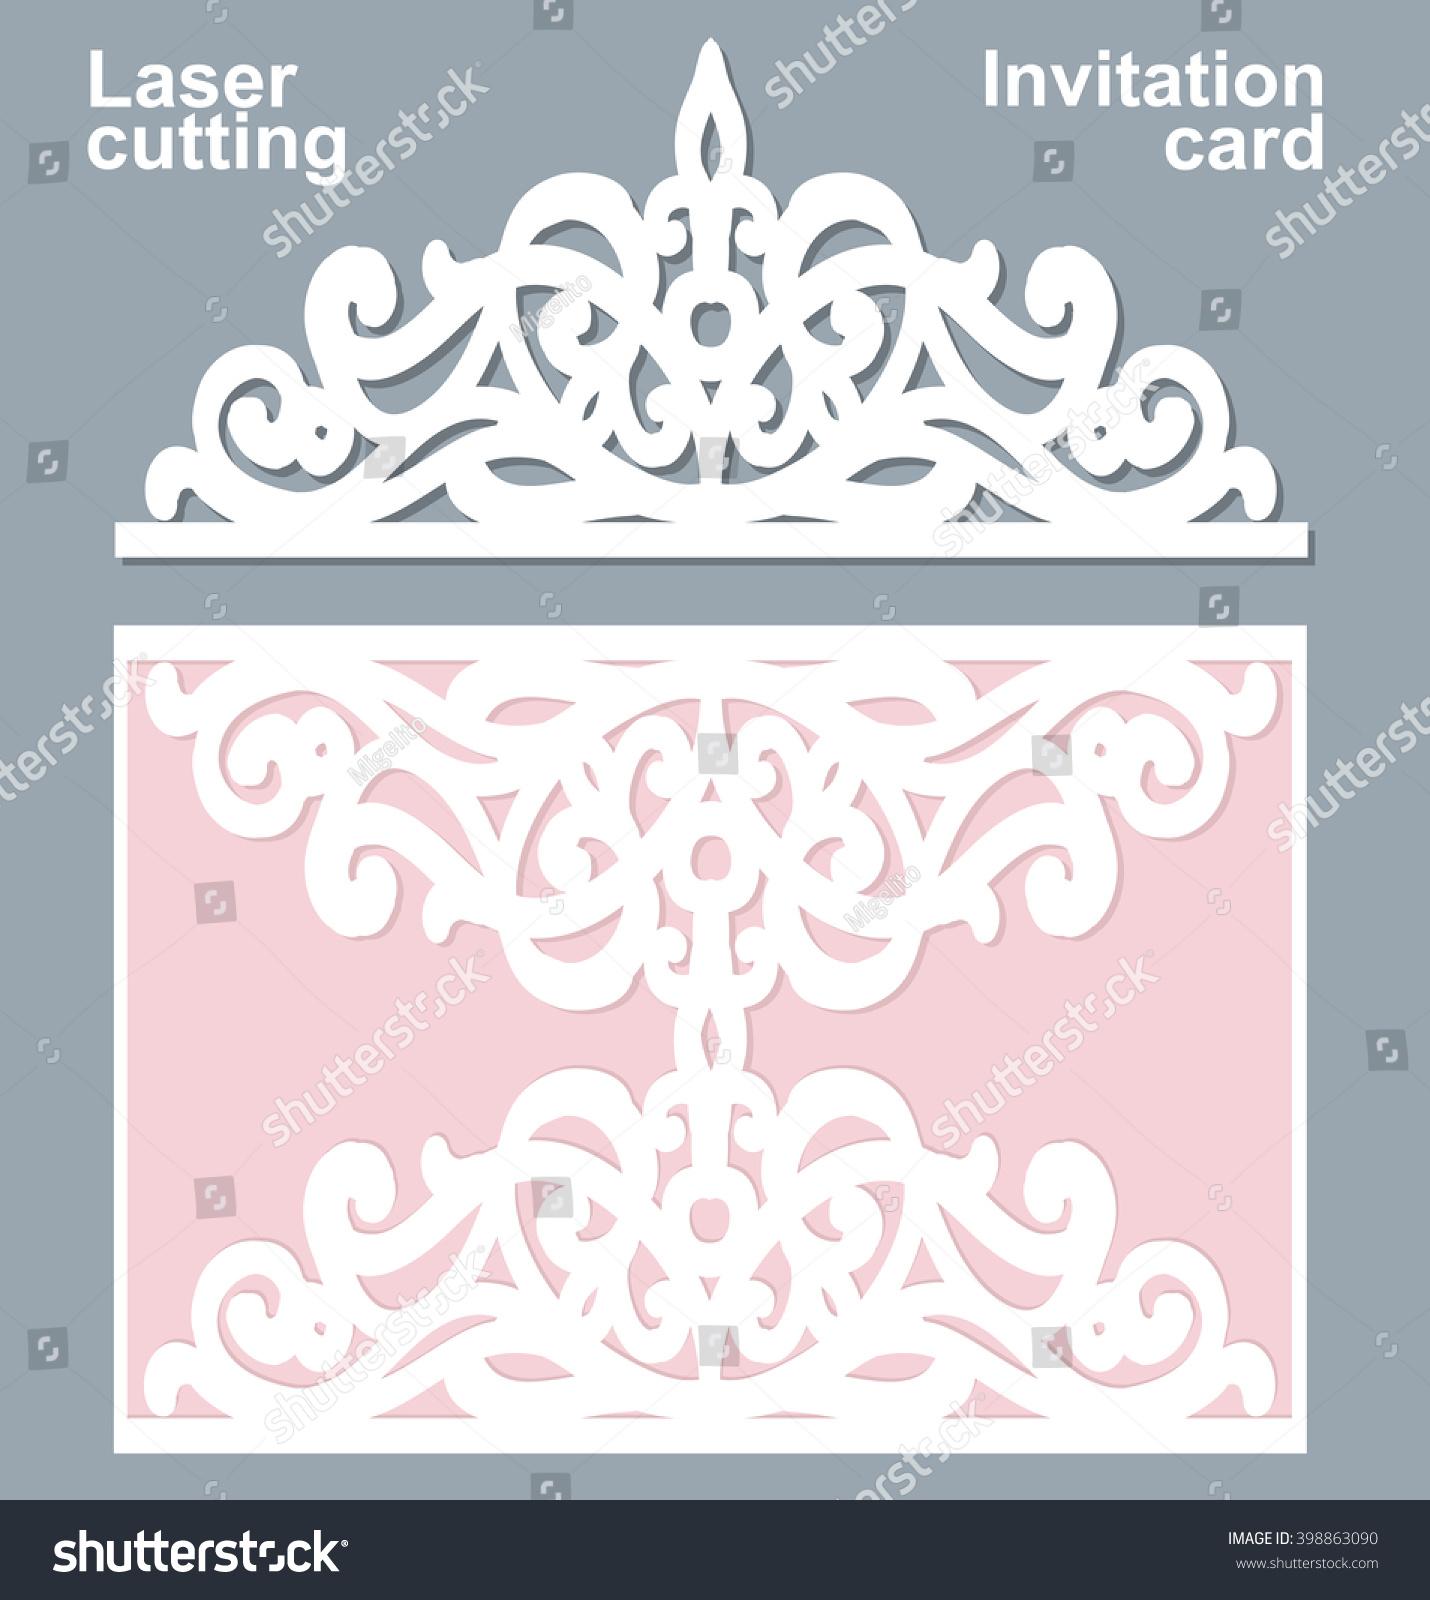 Vector Die Laser Cut Wedding Card Stock Vector 398863090 - Shutterstock